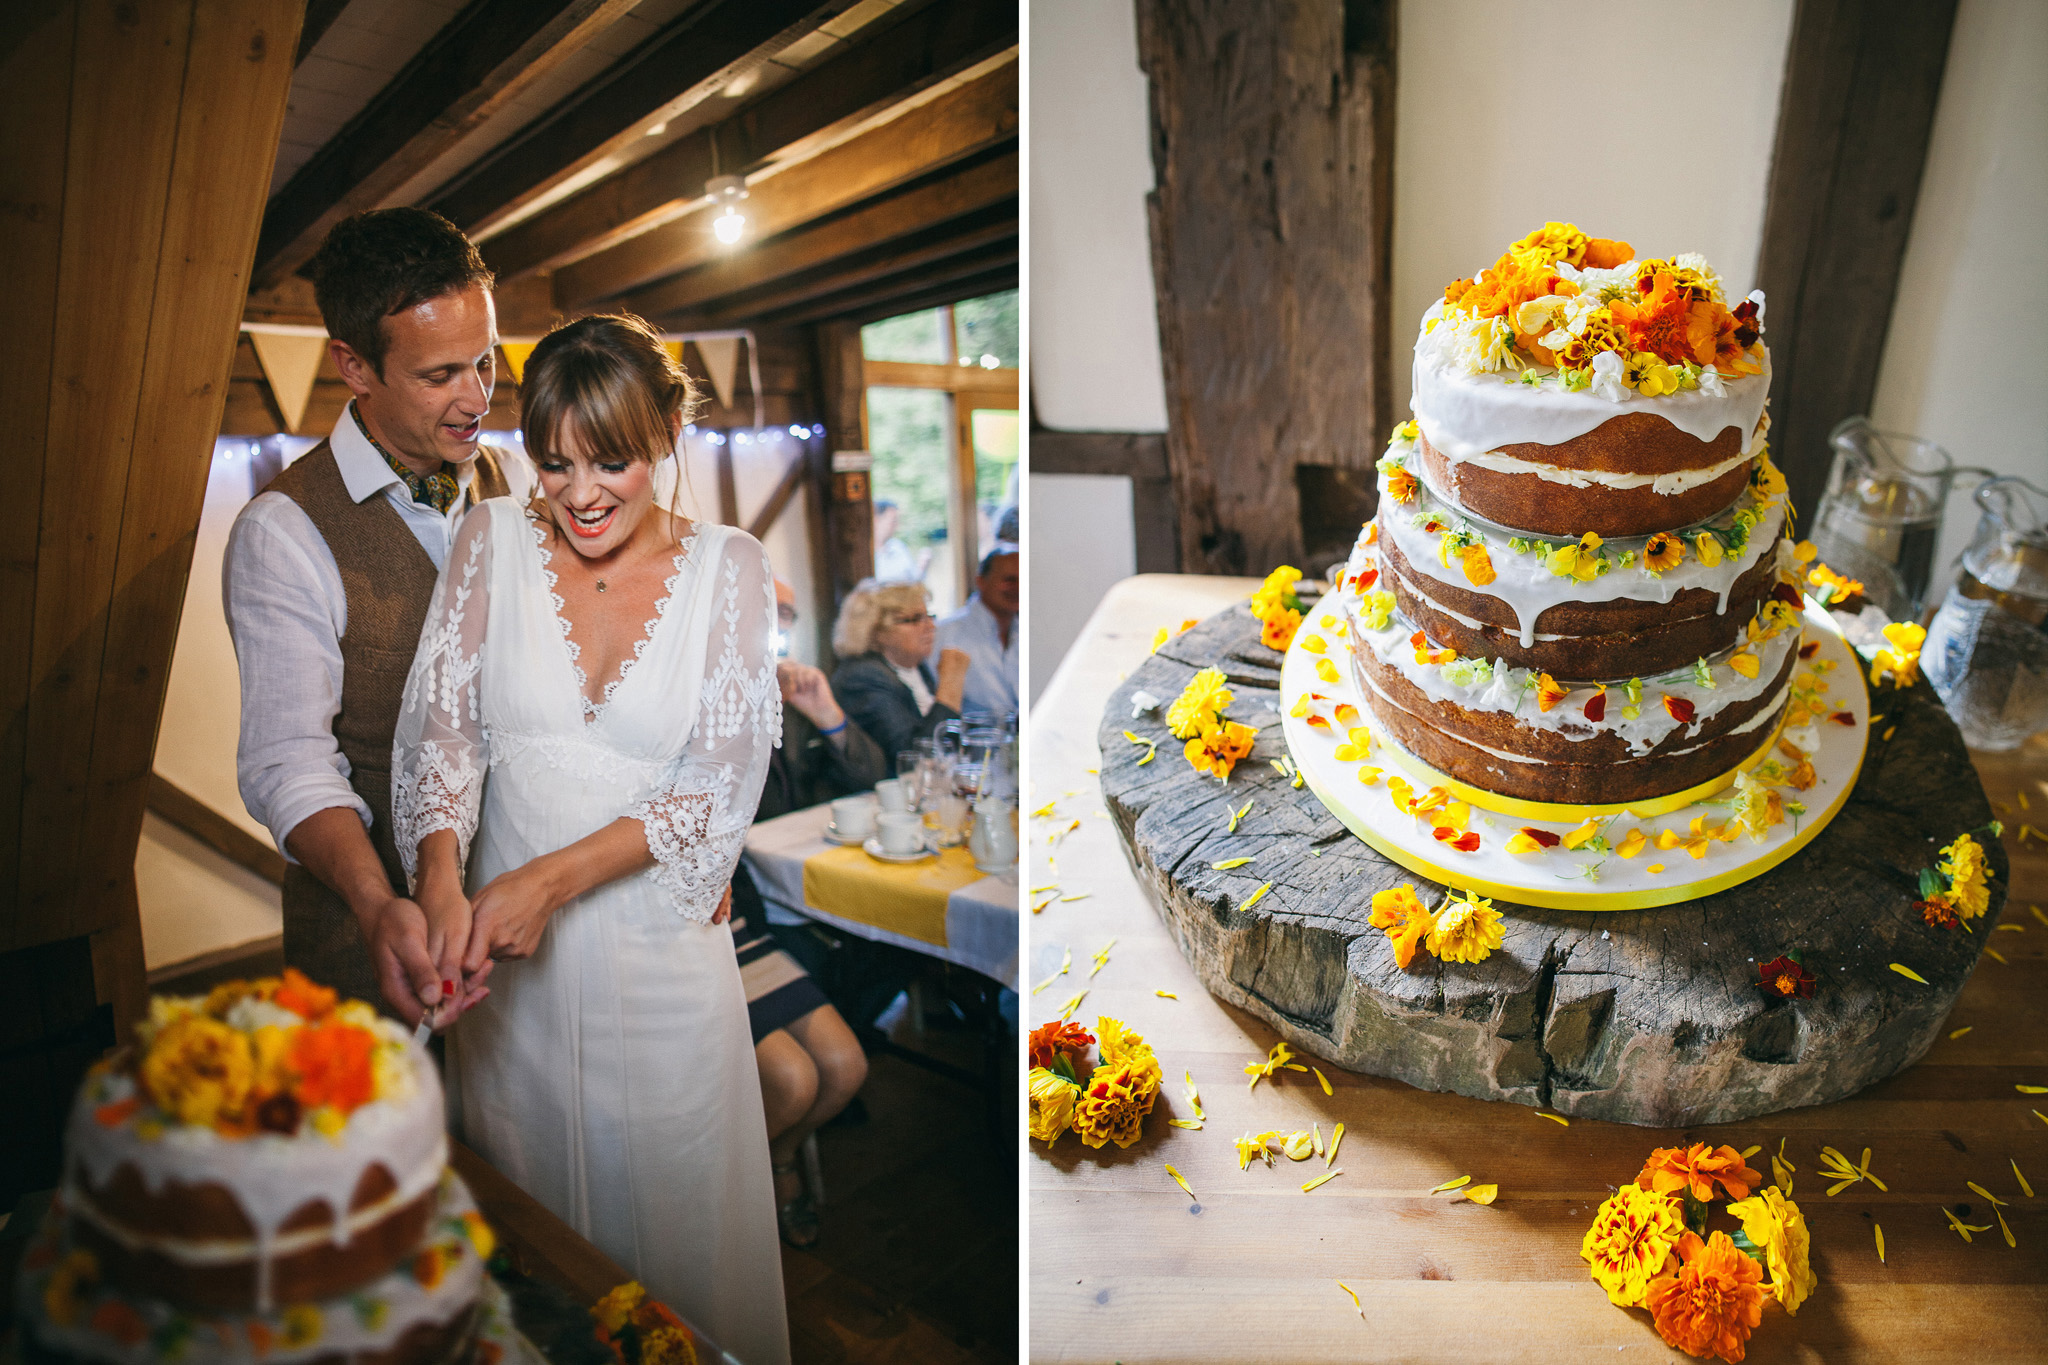 chantry_sussex_barn_wedding_354.jpg